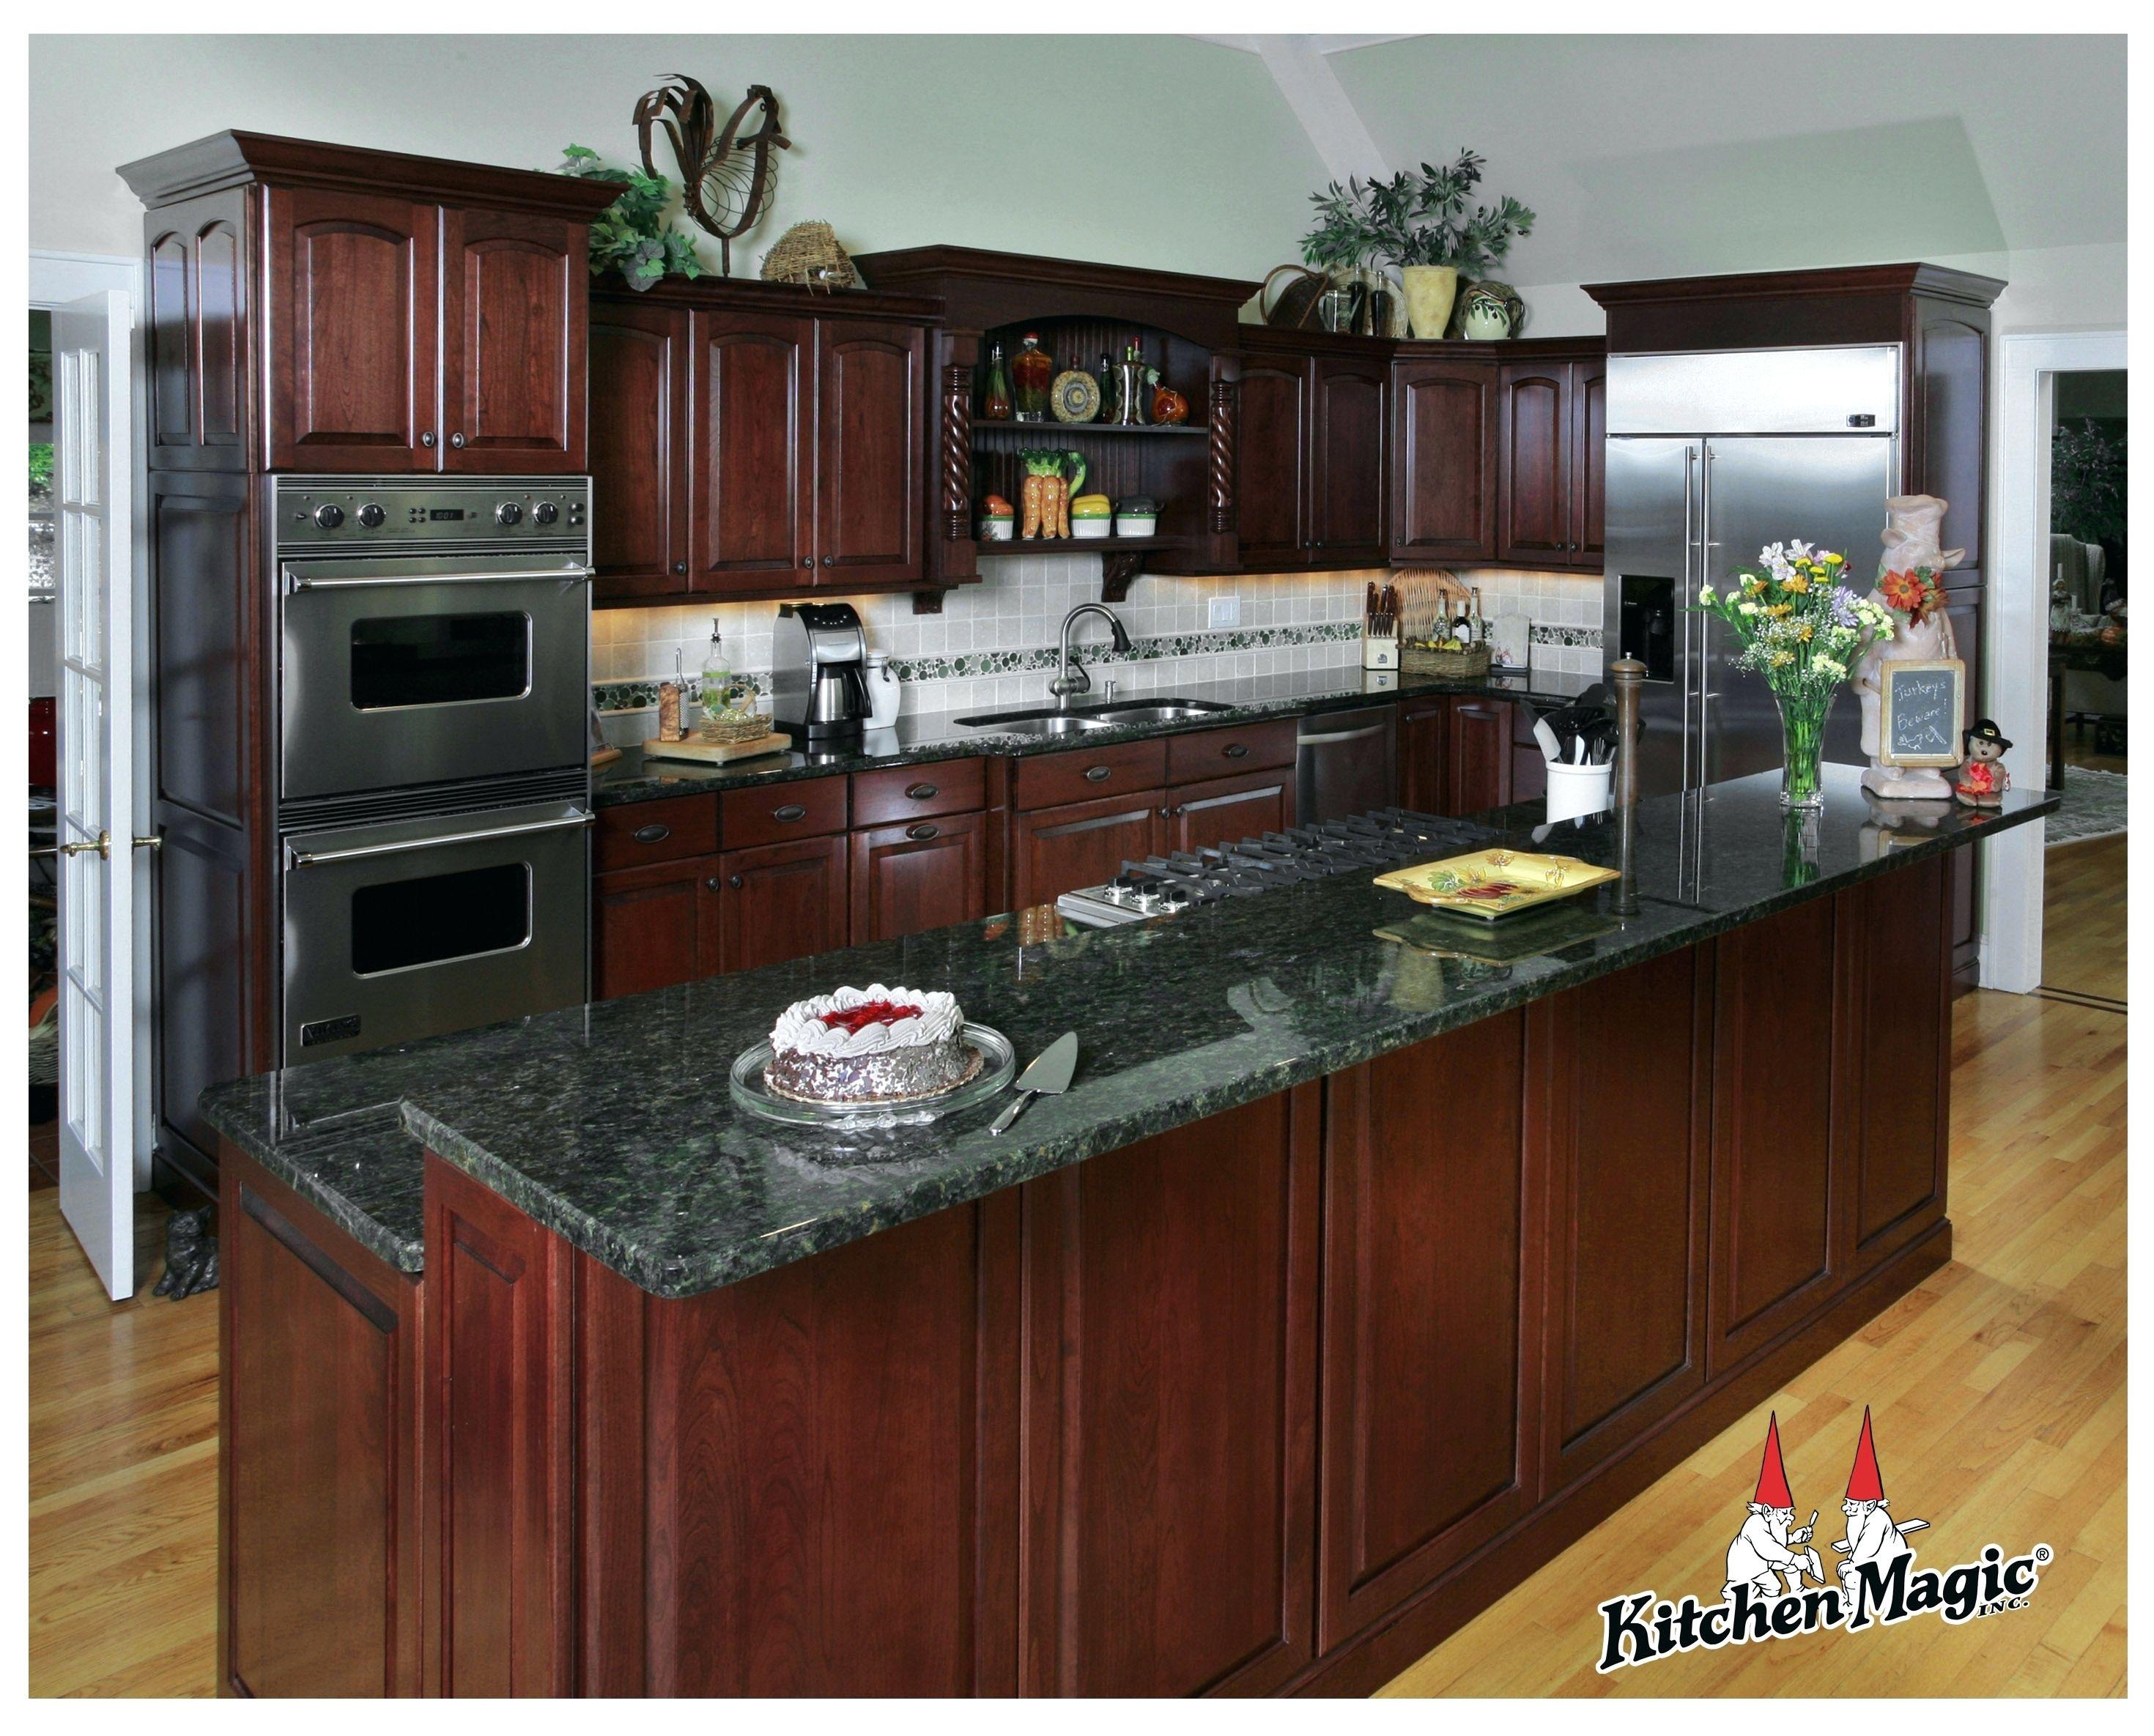 Magic Eraser Kitchen Cabinets Cherry Cabinets Kitchen Cherry Wood Kitchens Kitchen Cabinets And Granite